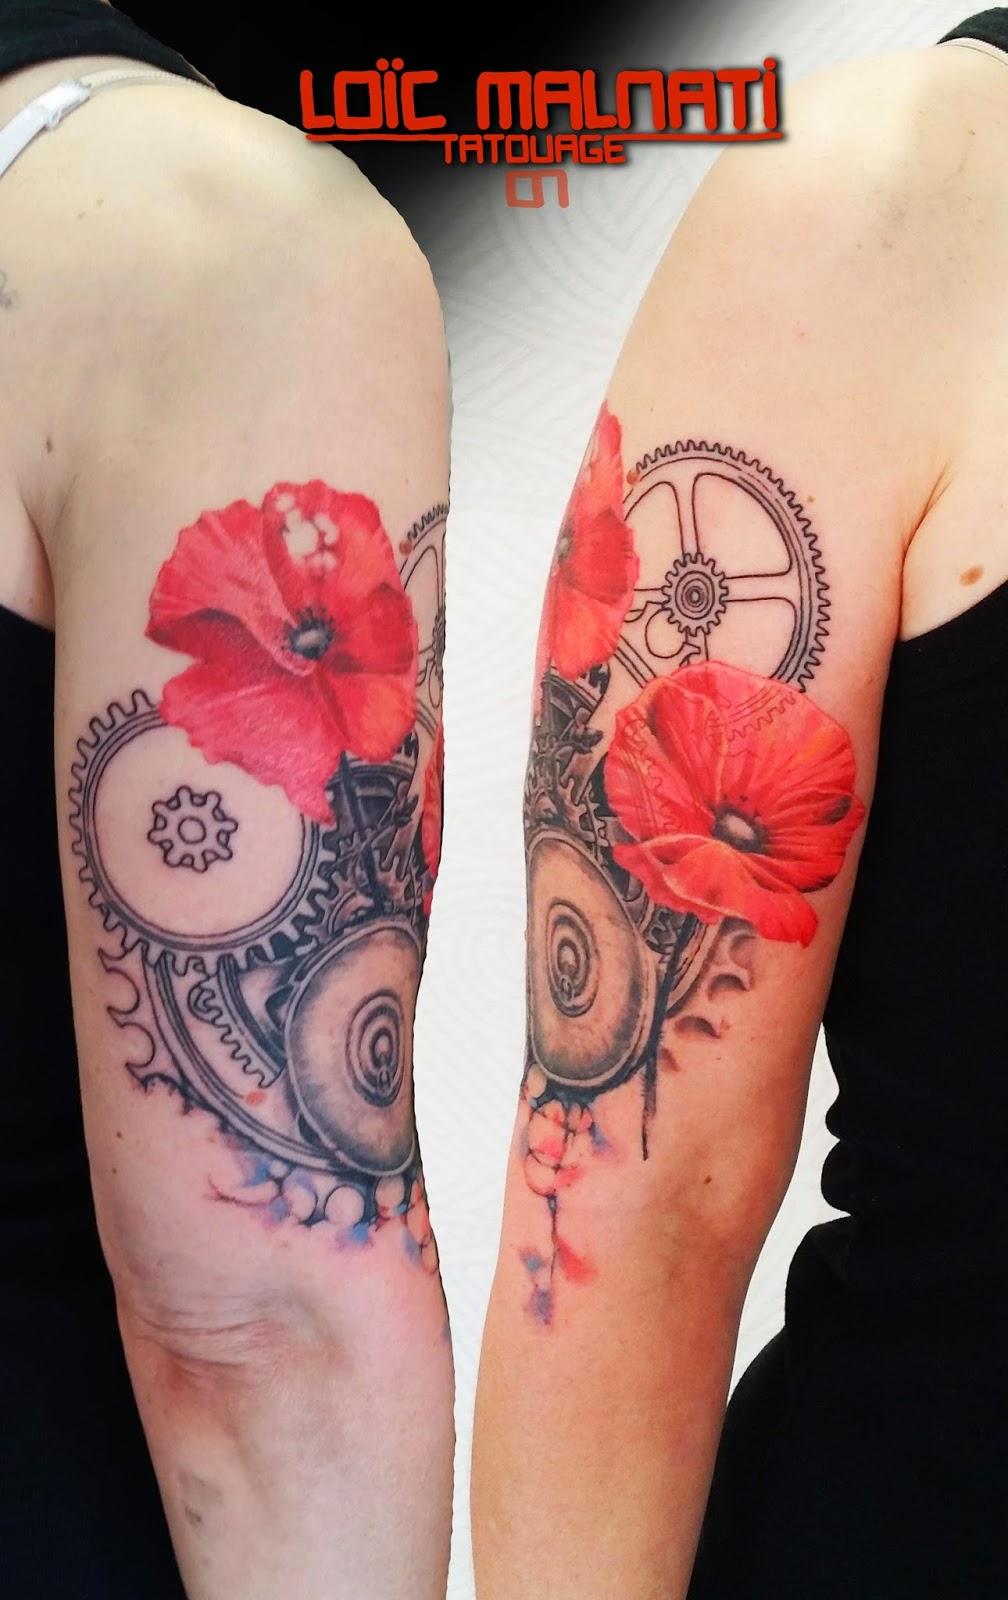 new visitez le site www loicmalnati com tatouage graphique graphic tattoo. Black Bedroom Furniture Sets. Home Design Ideas